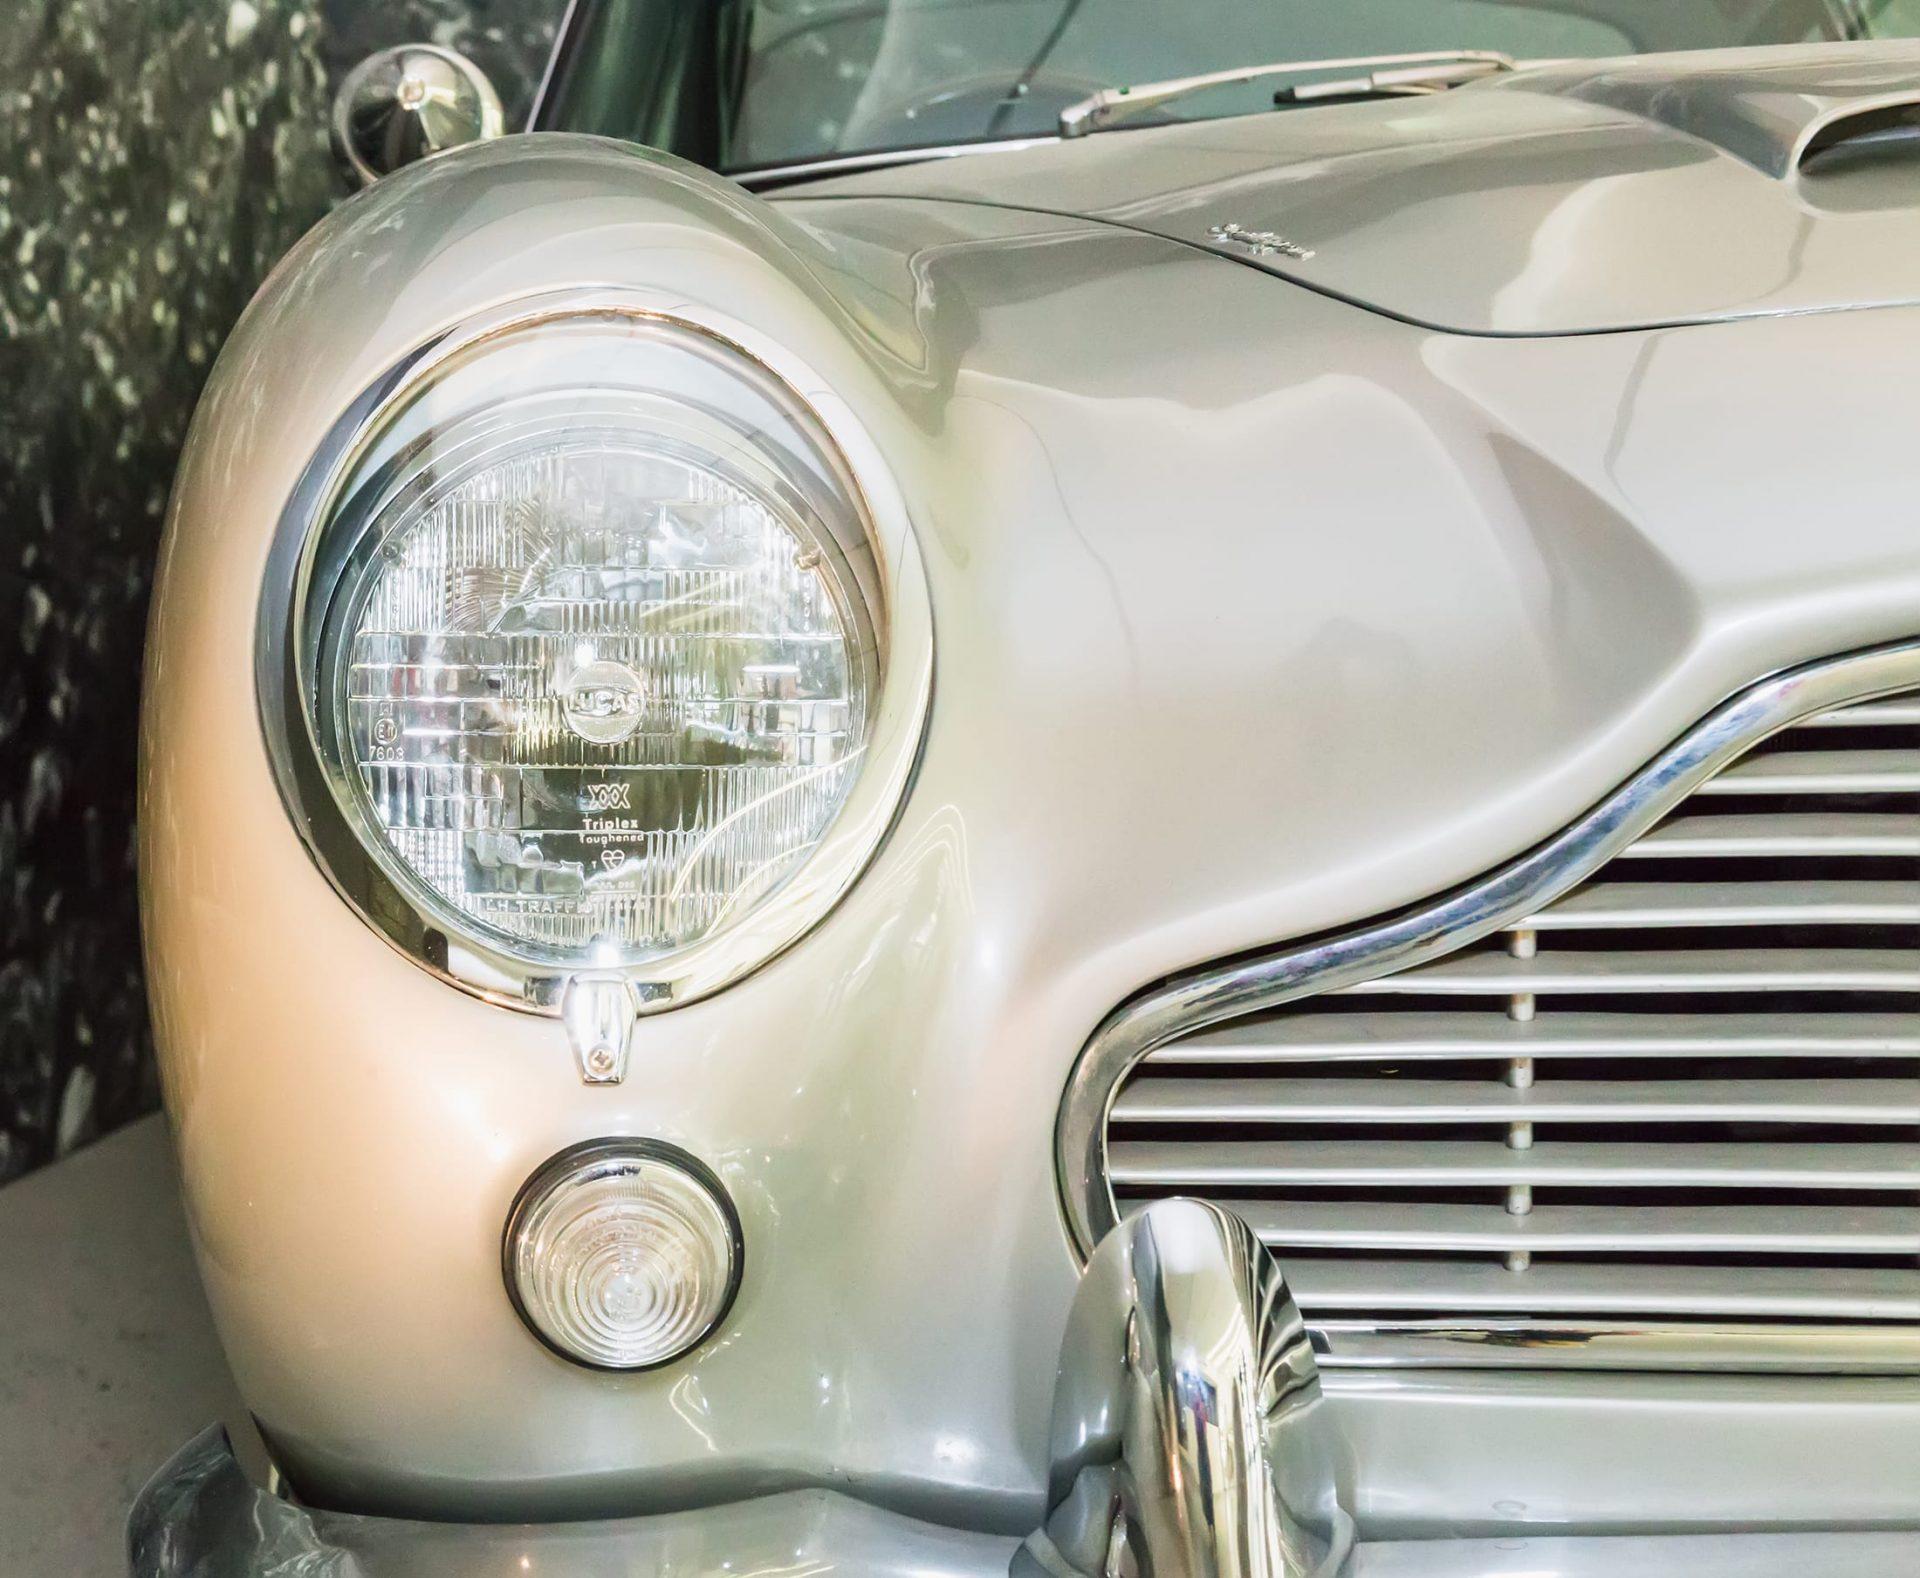 Front headlight of Aston Martin classic car